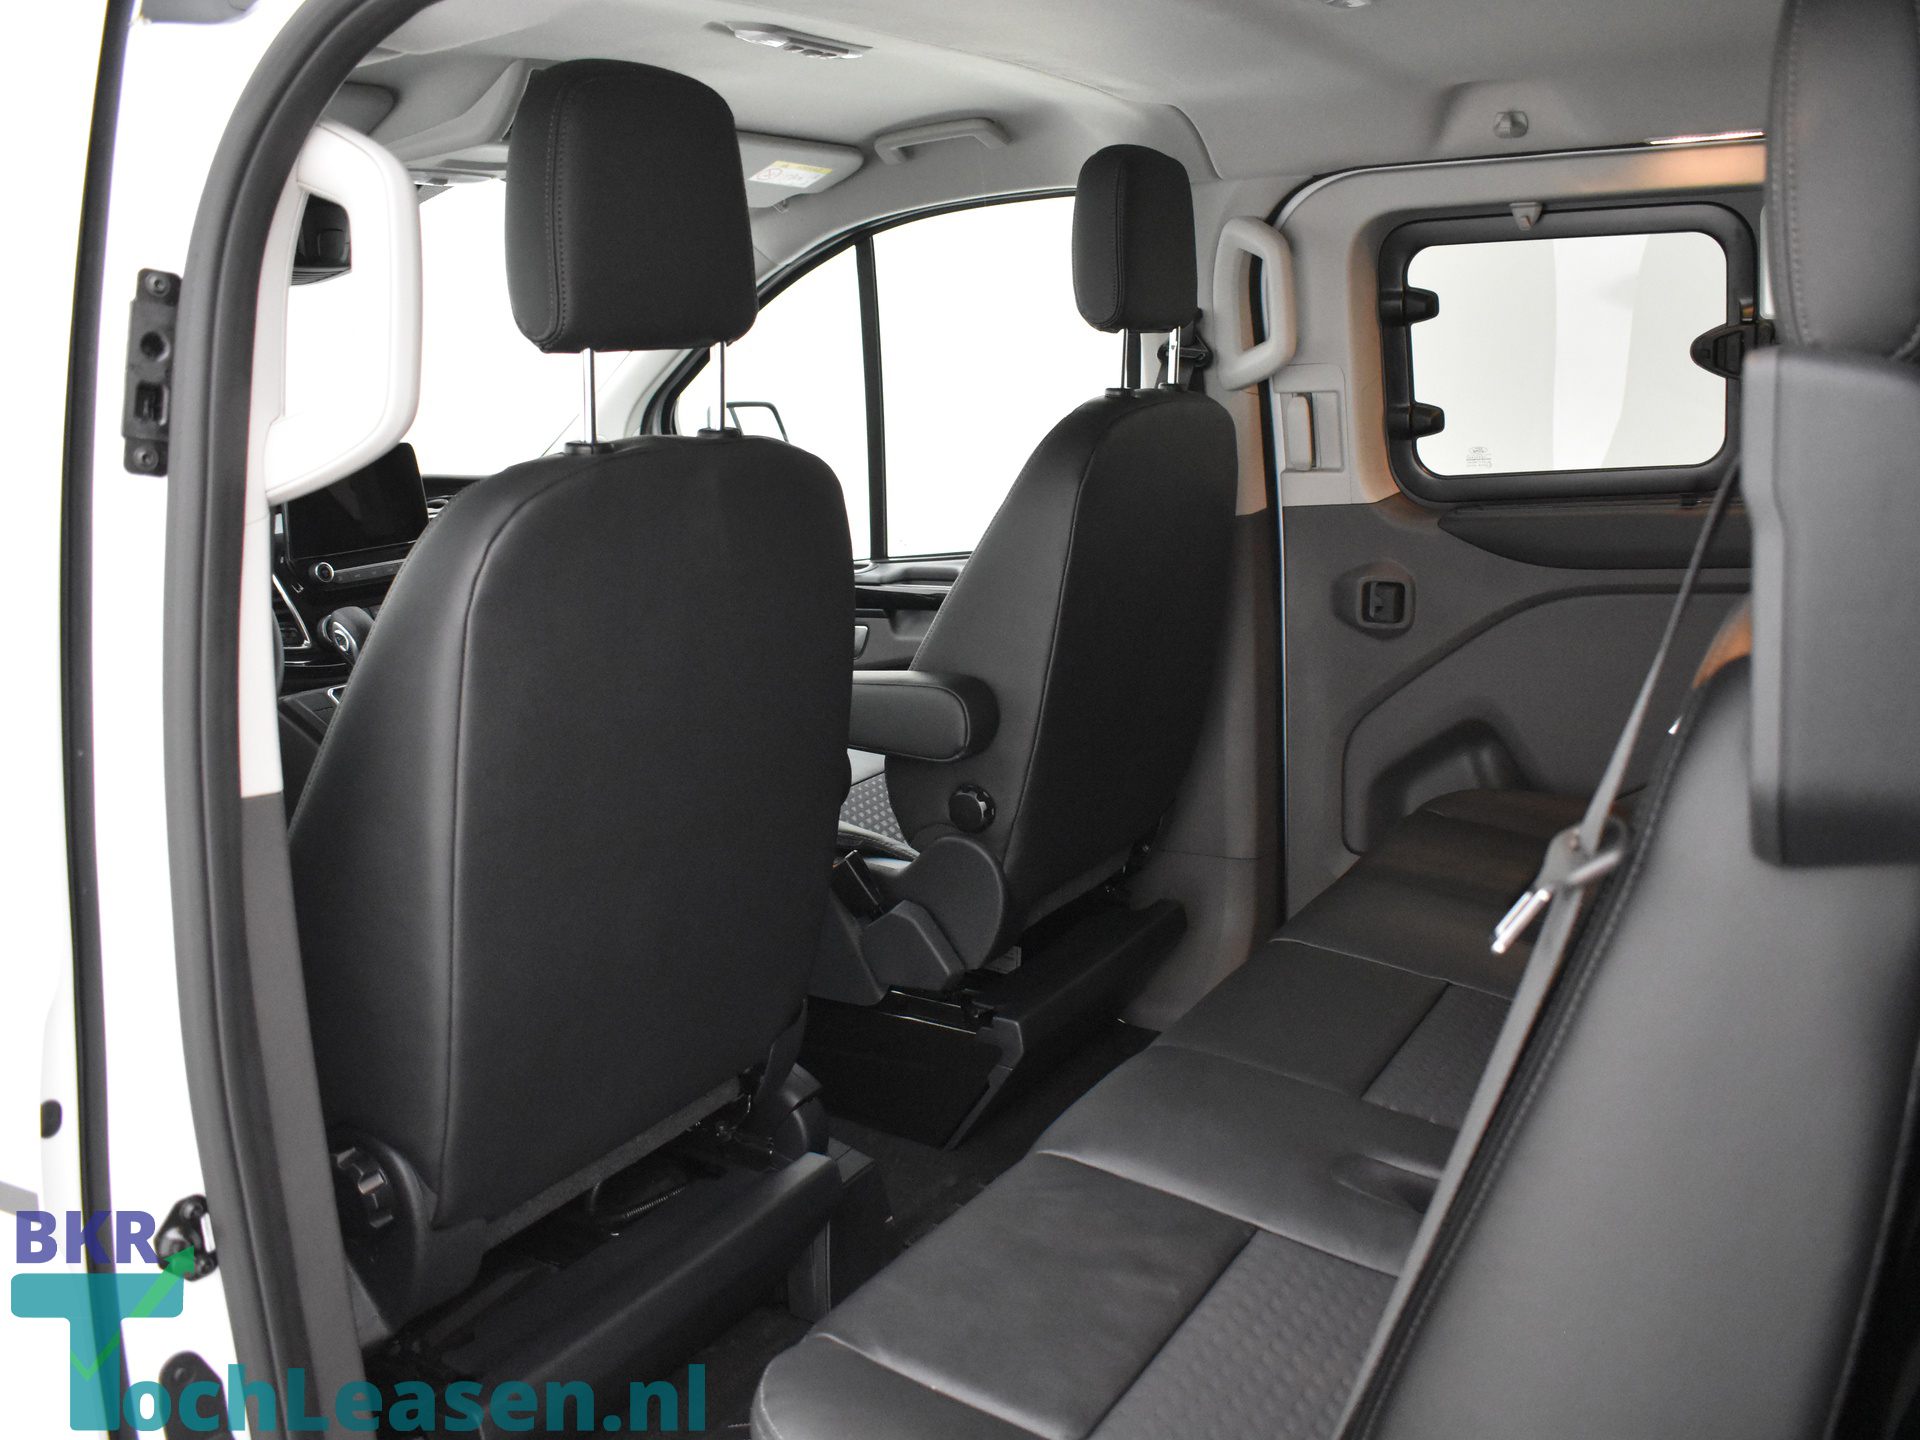 BKRtochleasen.nl - Ford Transit - Wit sport28